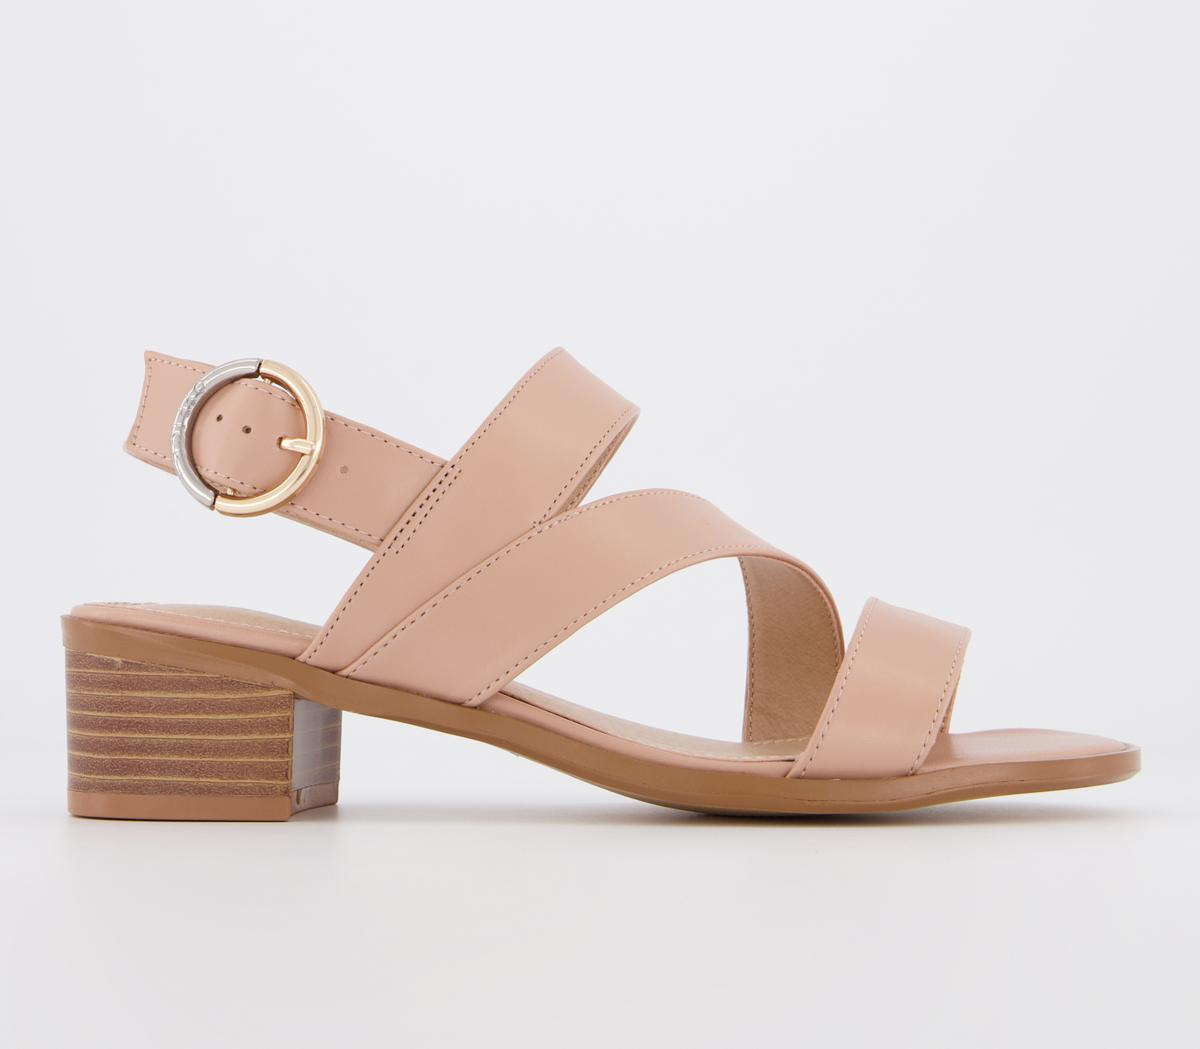 Margarita Asymmetric Low Block Sandals